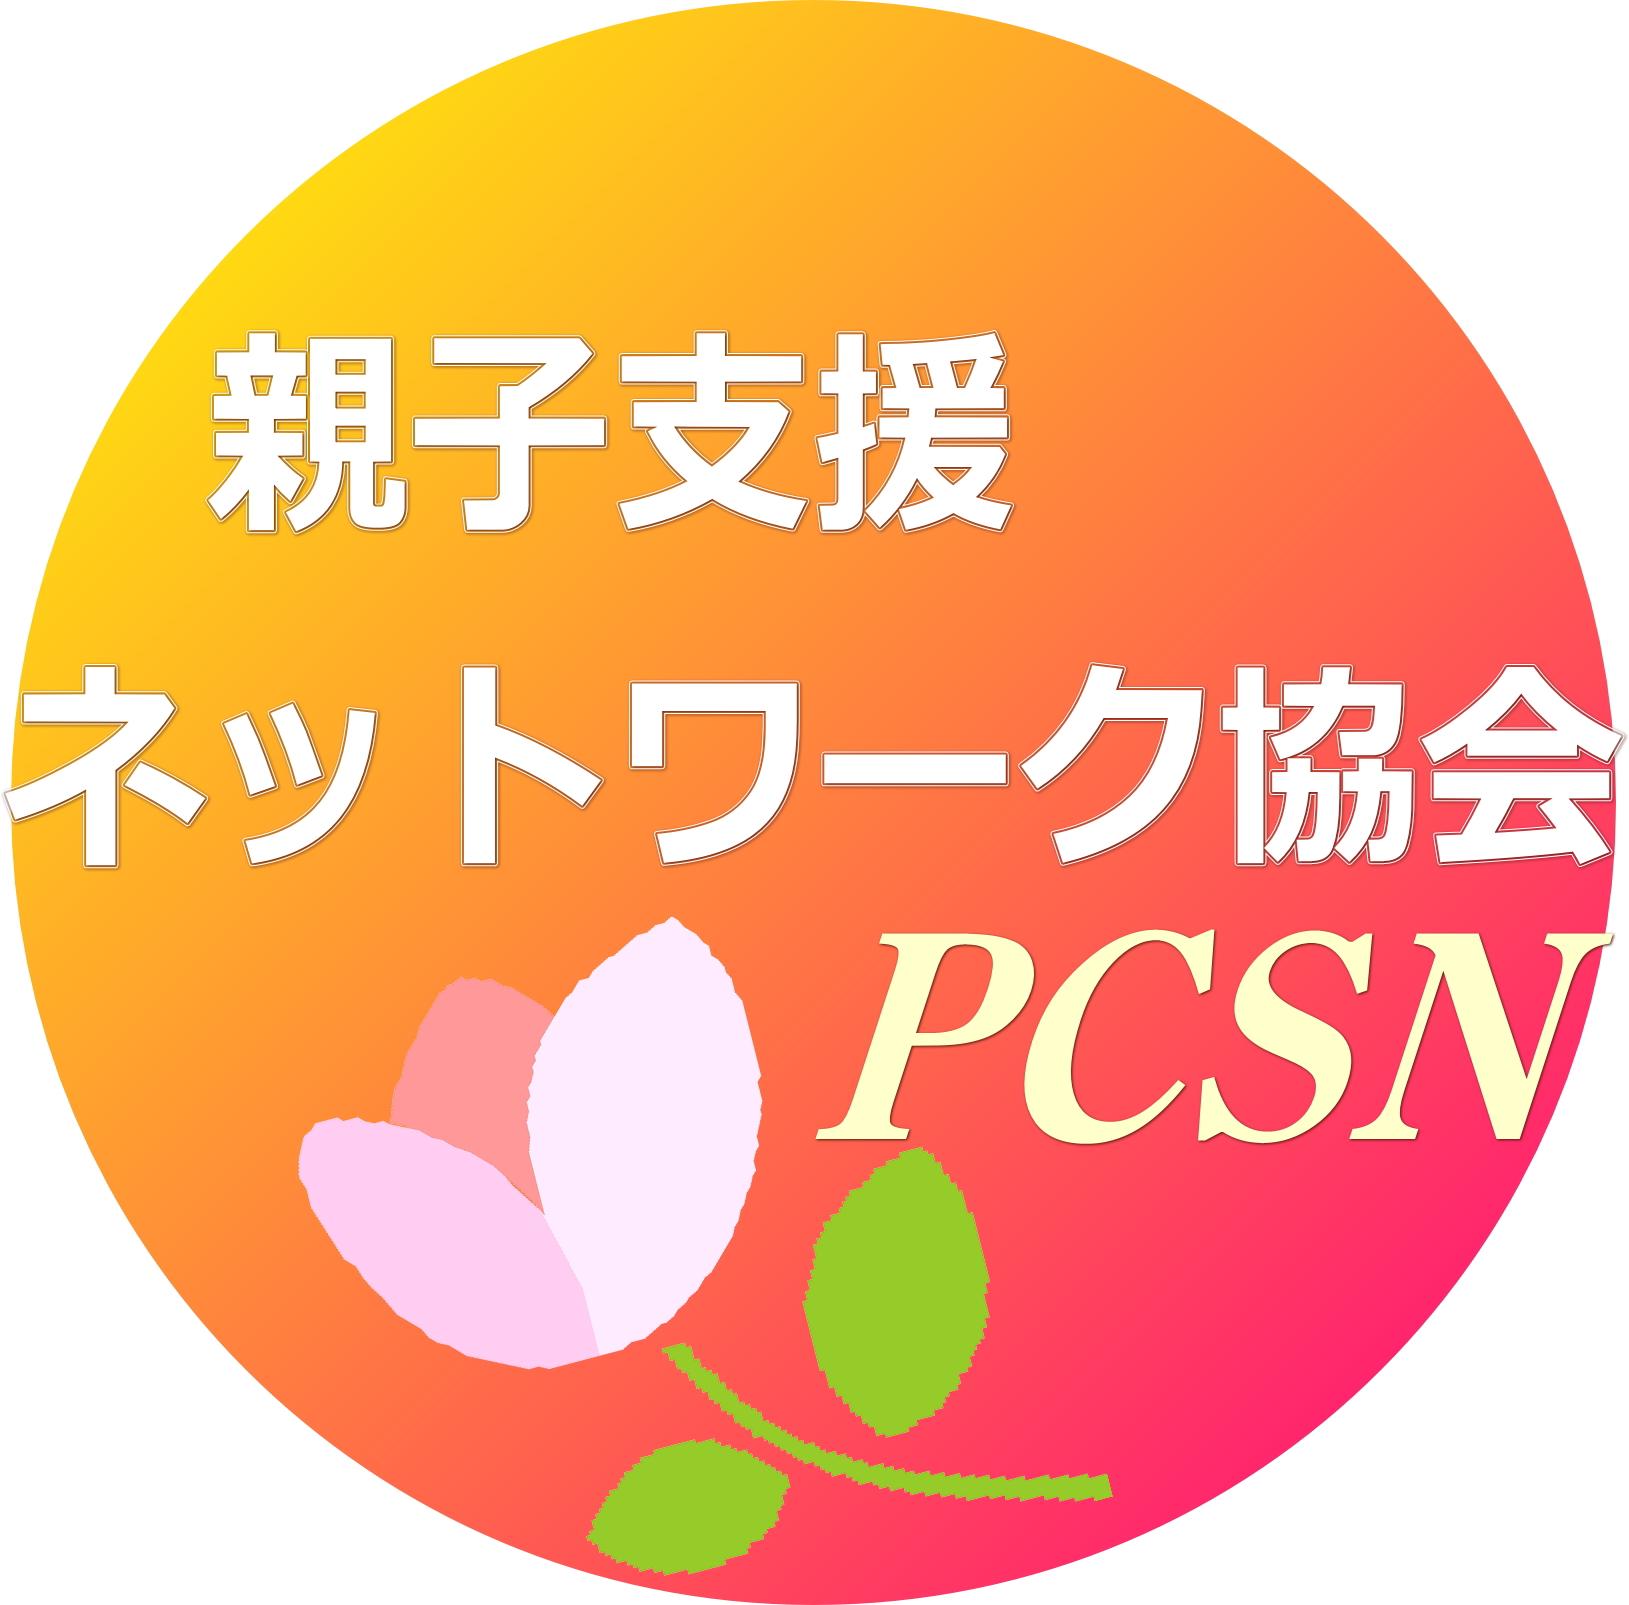 一般社団法人 親子支援ネットワーク協会